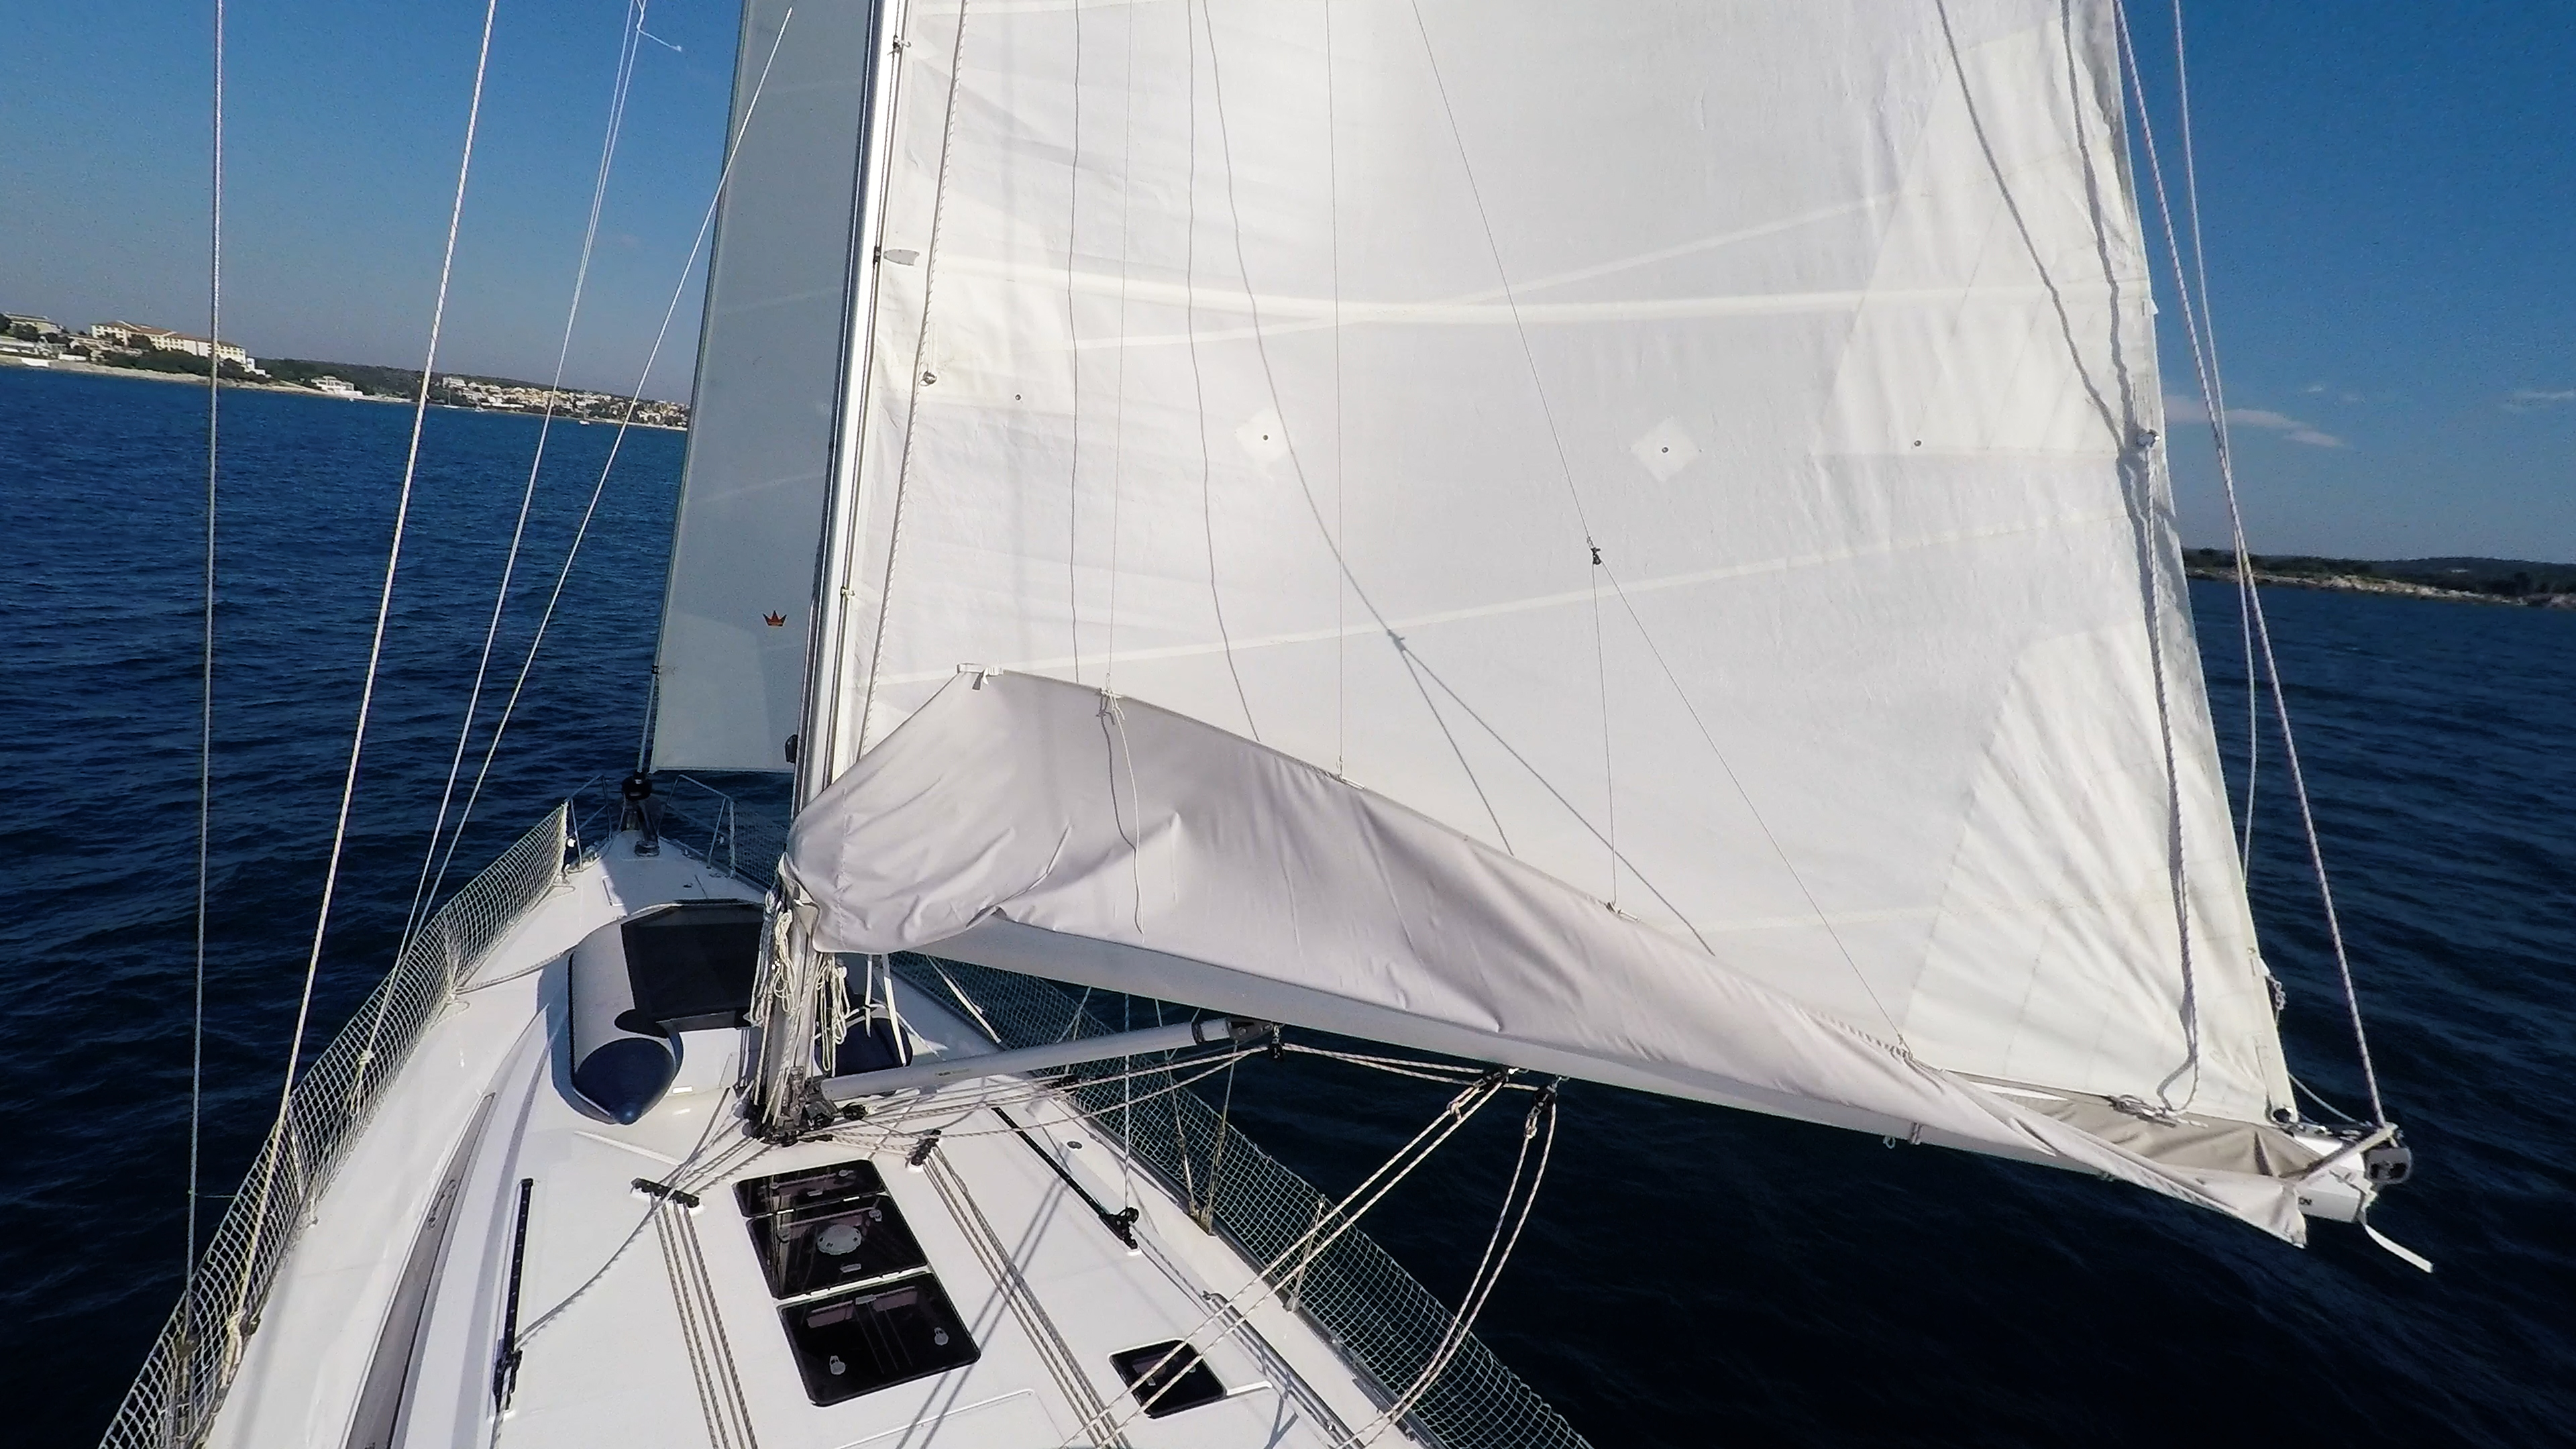 barcha a vela yacht a vela albero vele randa gommone sul ponte